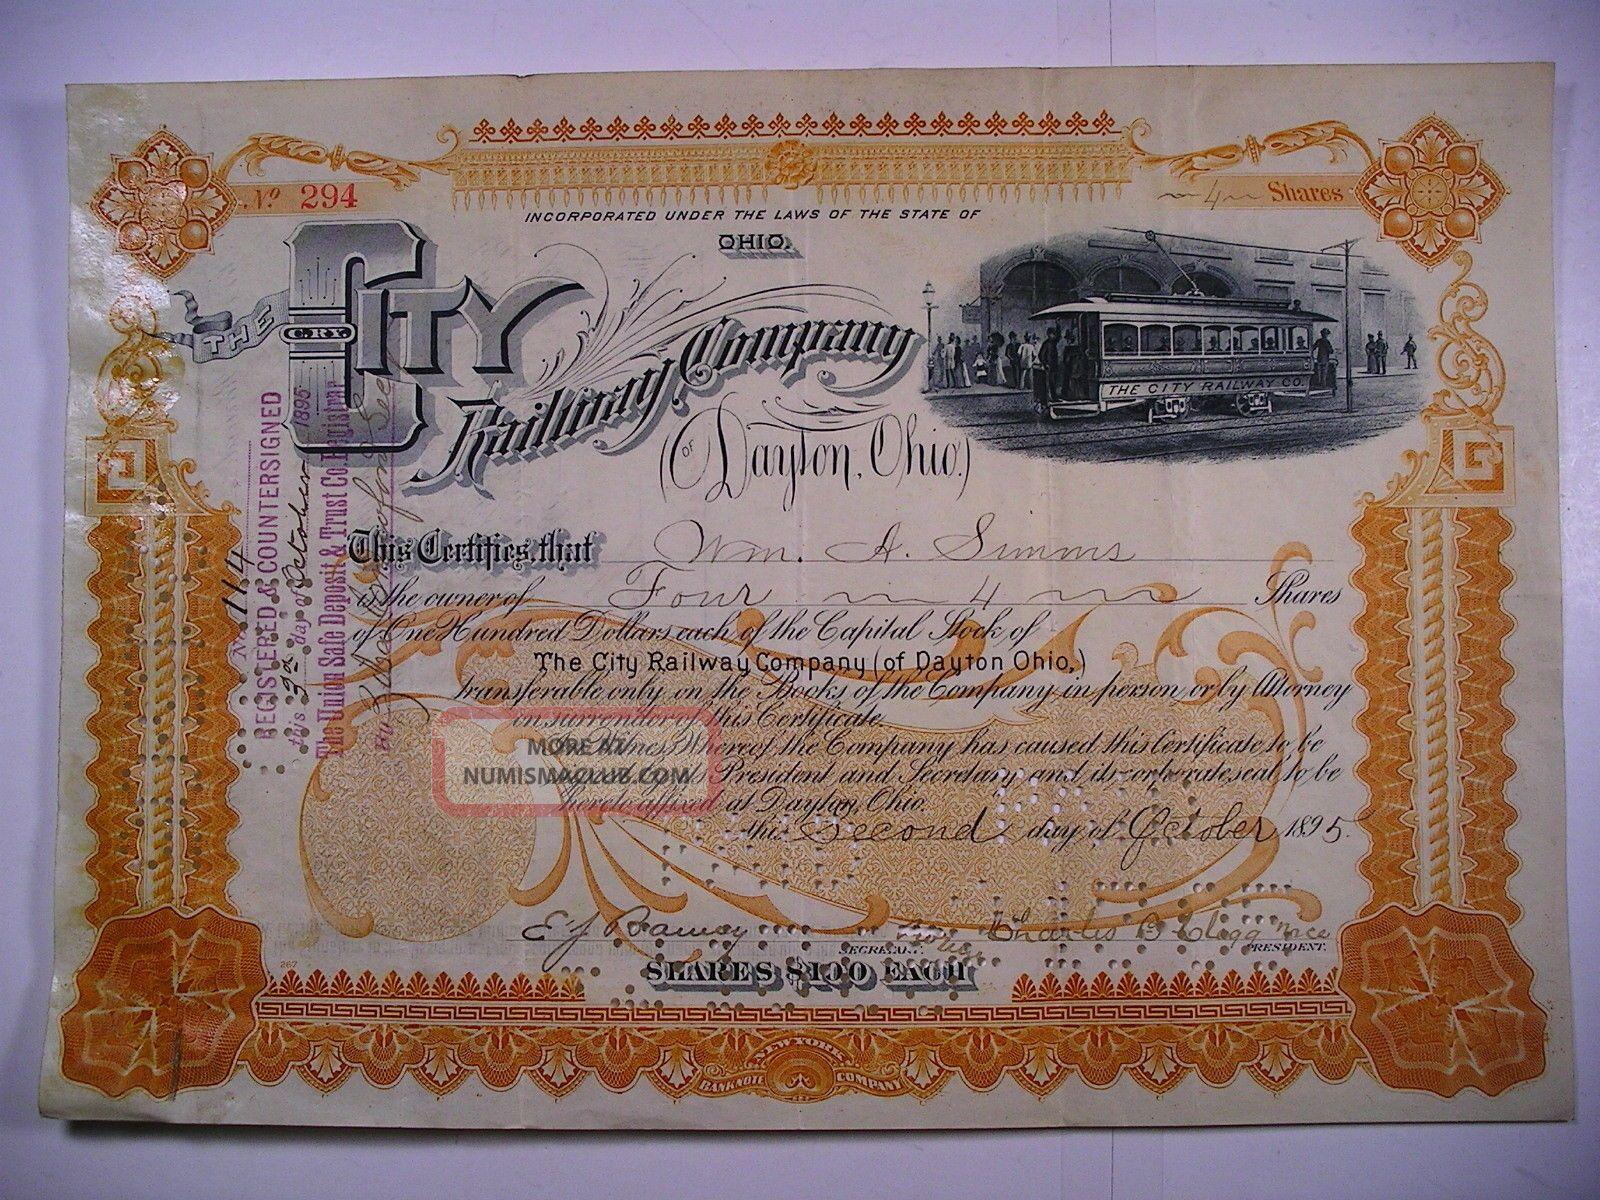 1895 Stock Cert City Railway Co Of Dayton Ohio 4 Sh Vignette Electric Streetcar Transportation photo